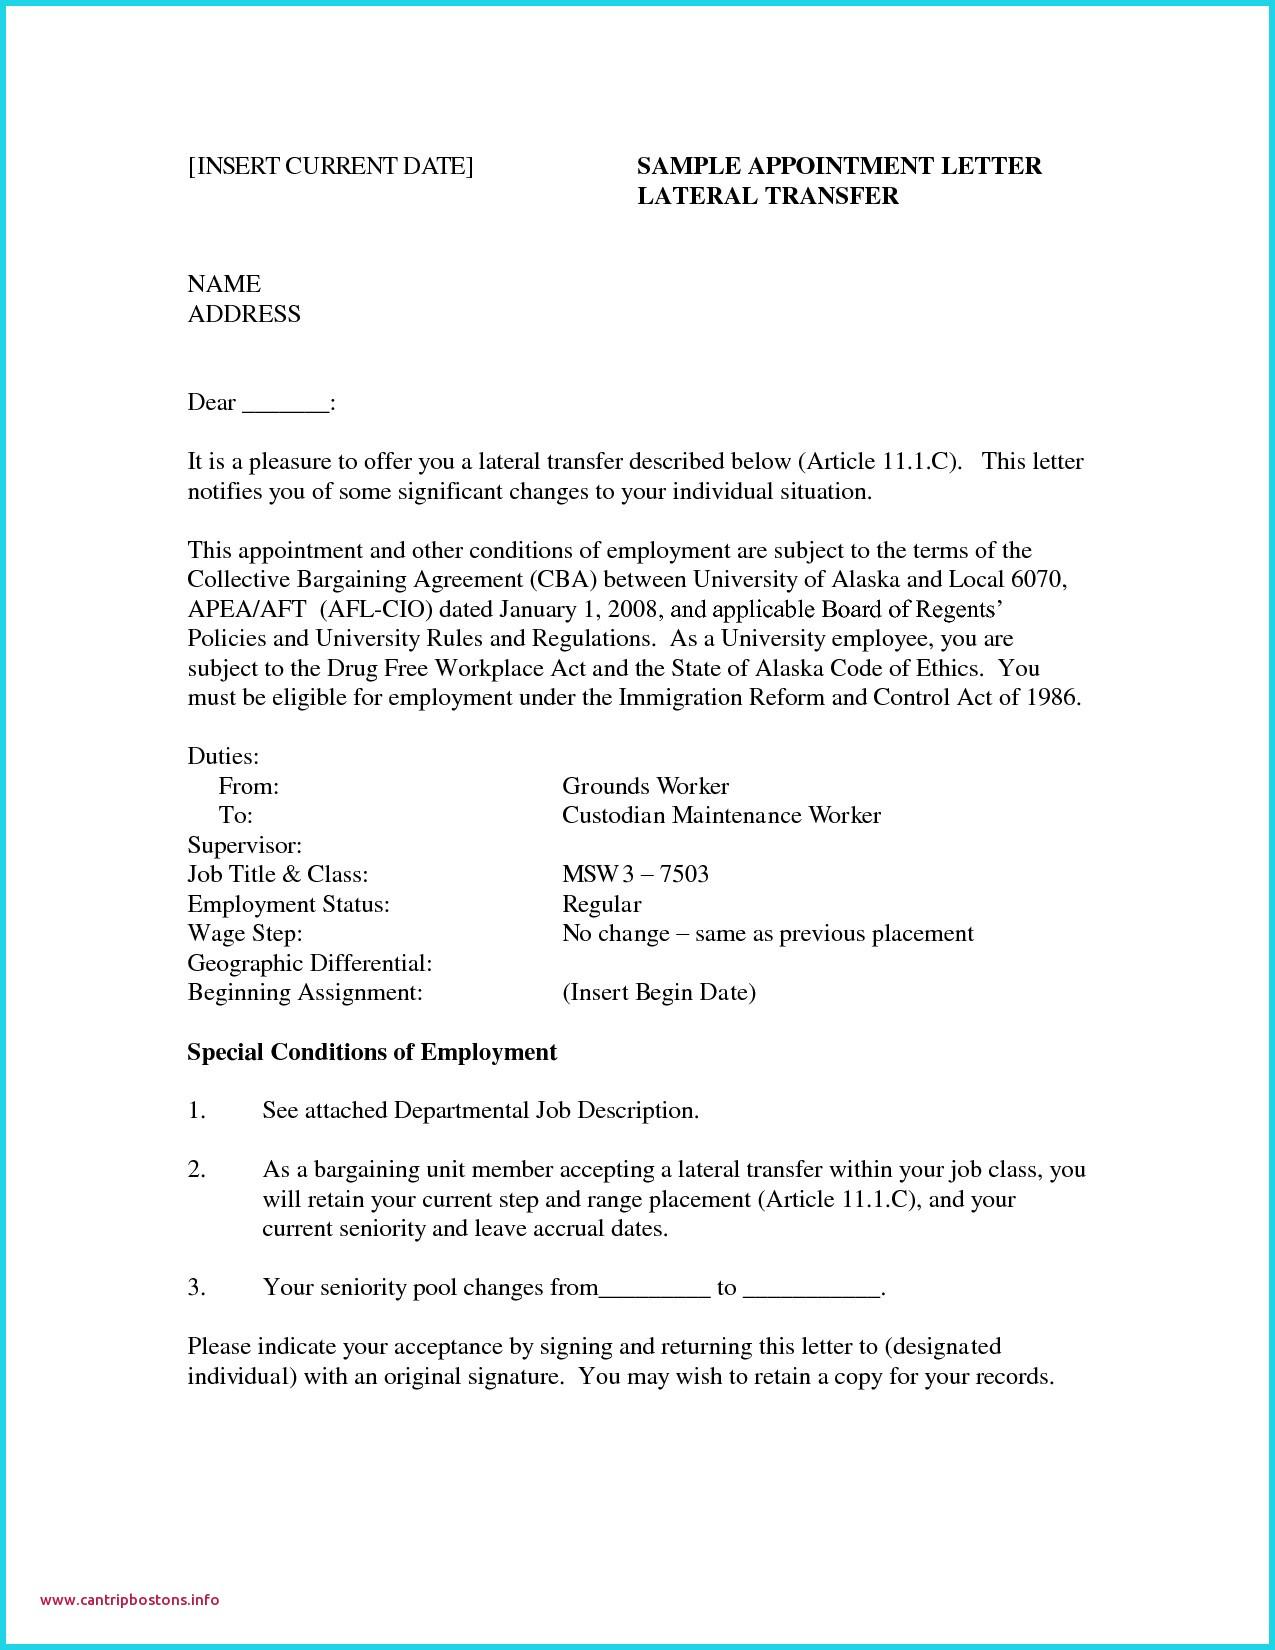 Expired Listing Letter Template - Expired Listing Letter